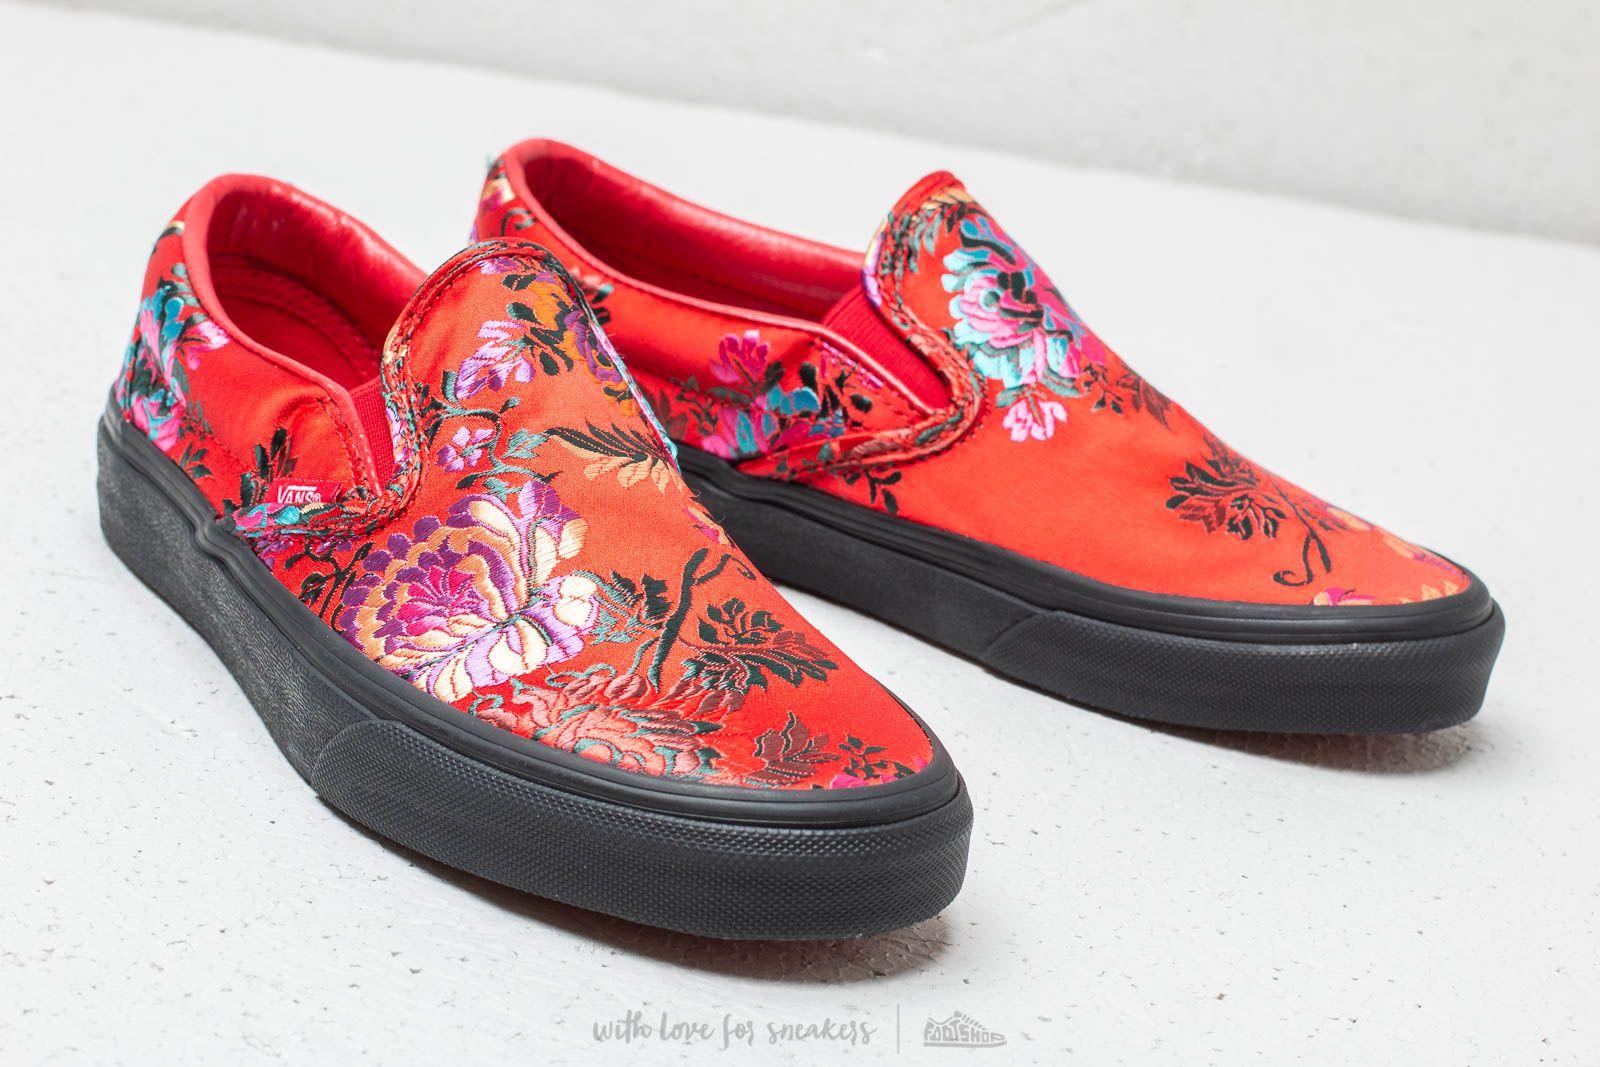 Satin Satin Satin festival Classic On Vans Footshop Slip Red Black qHwI7vSn 56c1e5cc7